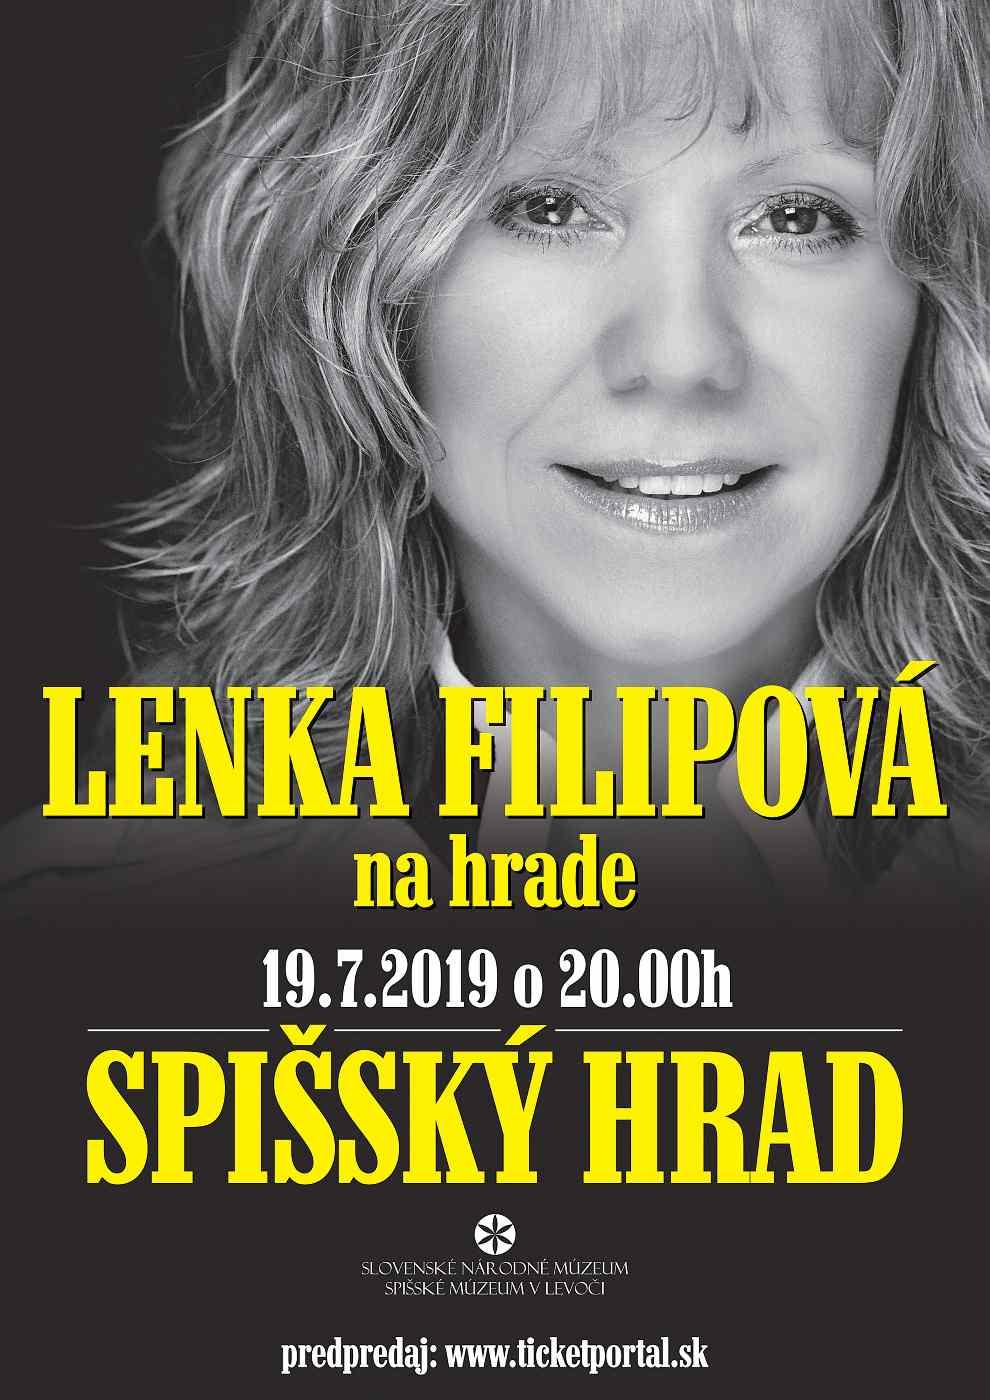 picture Lenka Filipová na HRADE